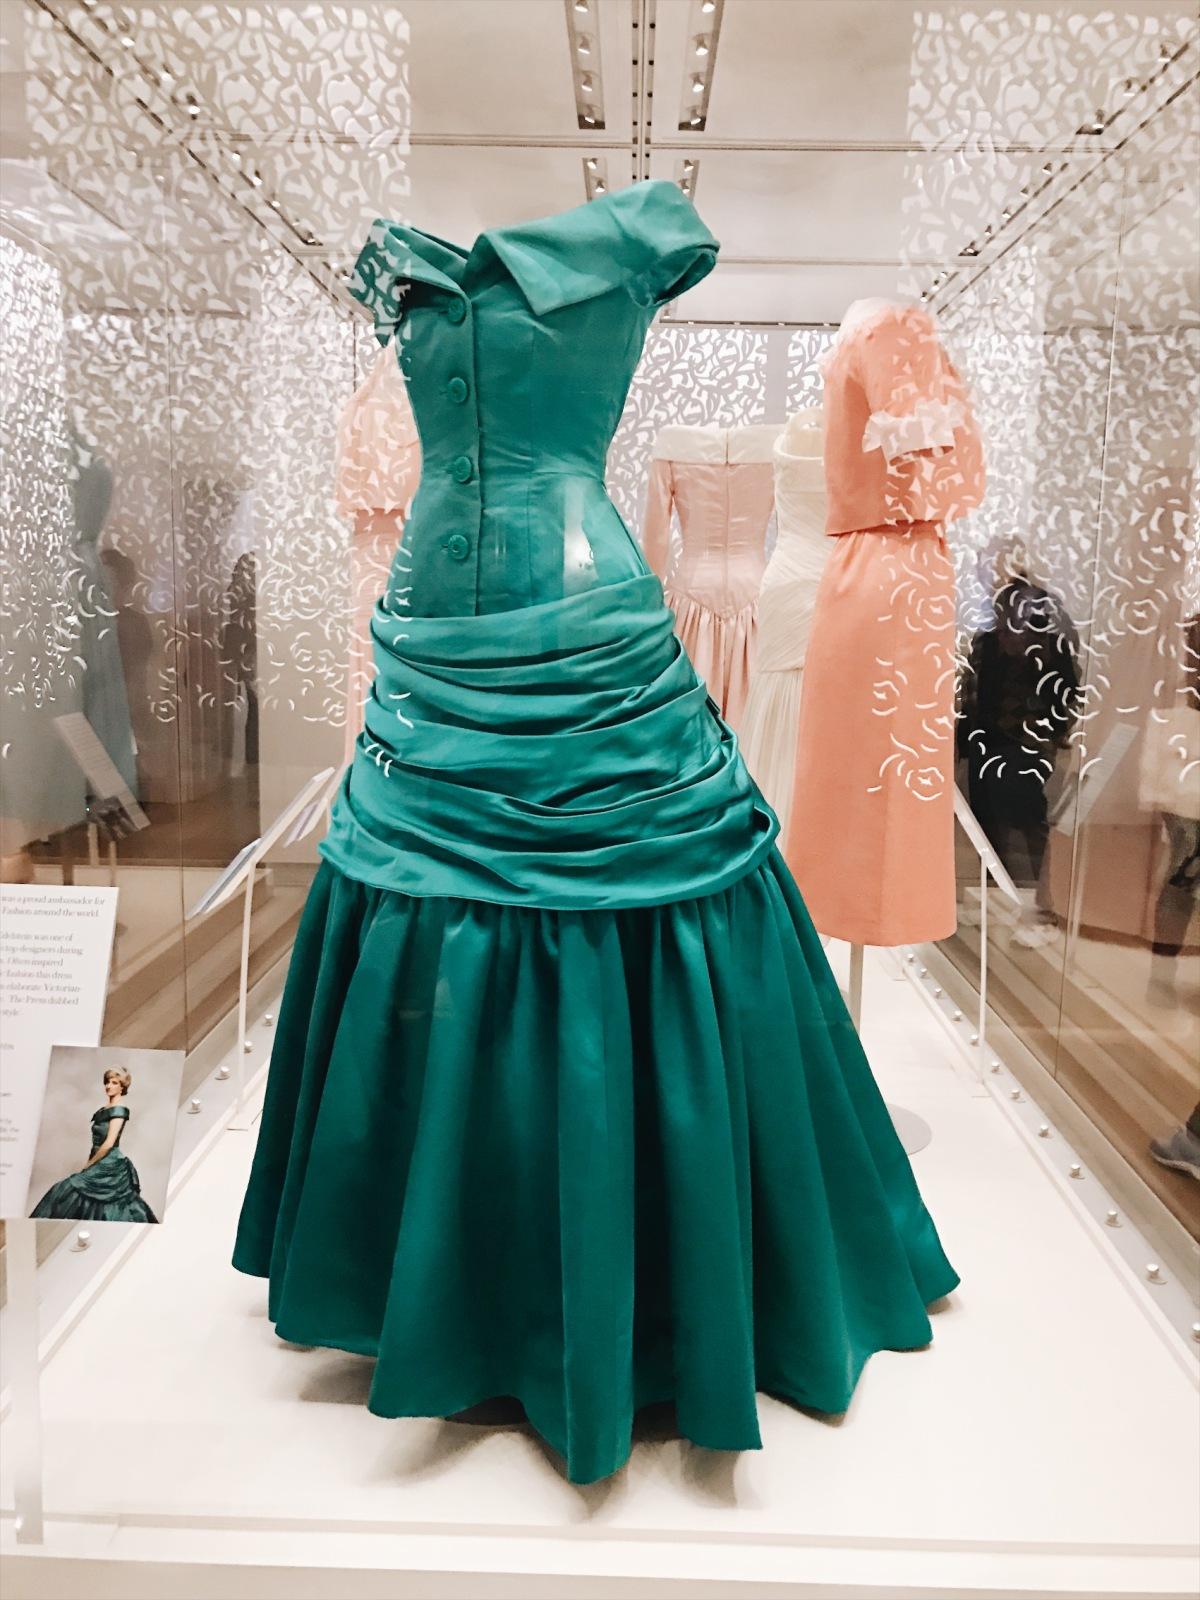 Princess Diana: Her Fashion Story, Princess Diana, fashion exhibit, Kensington Palace, London, UK, United Kingdom